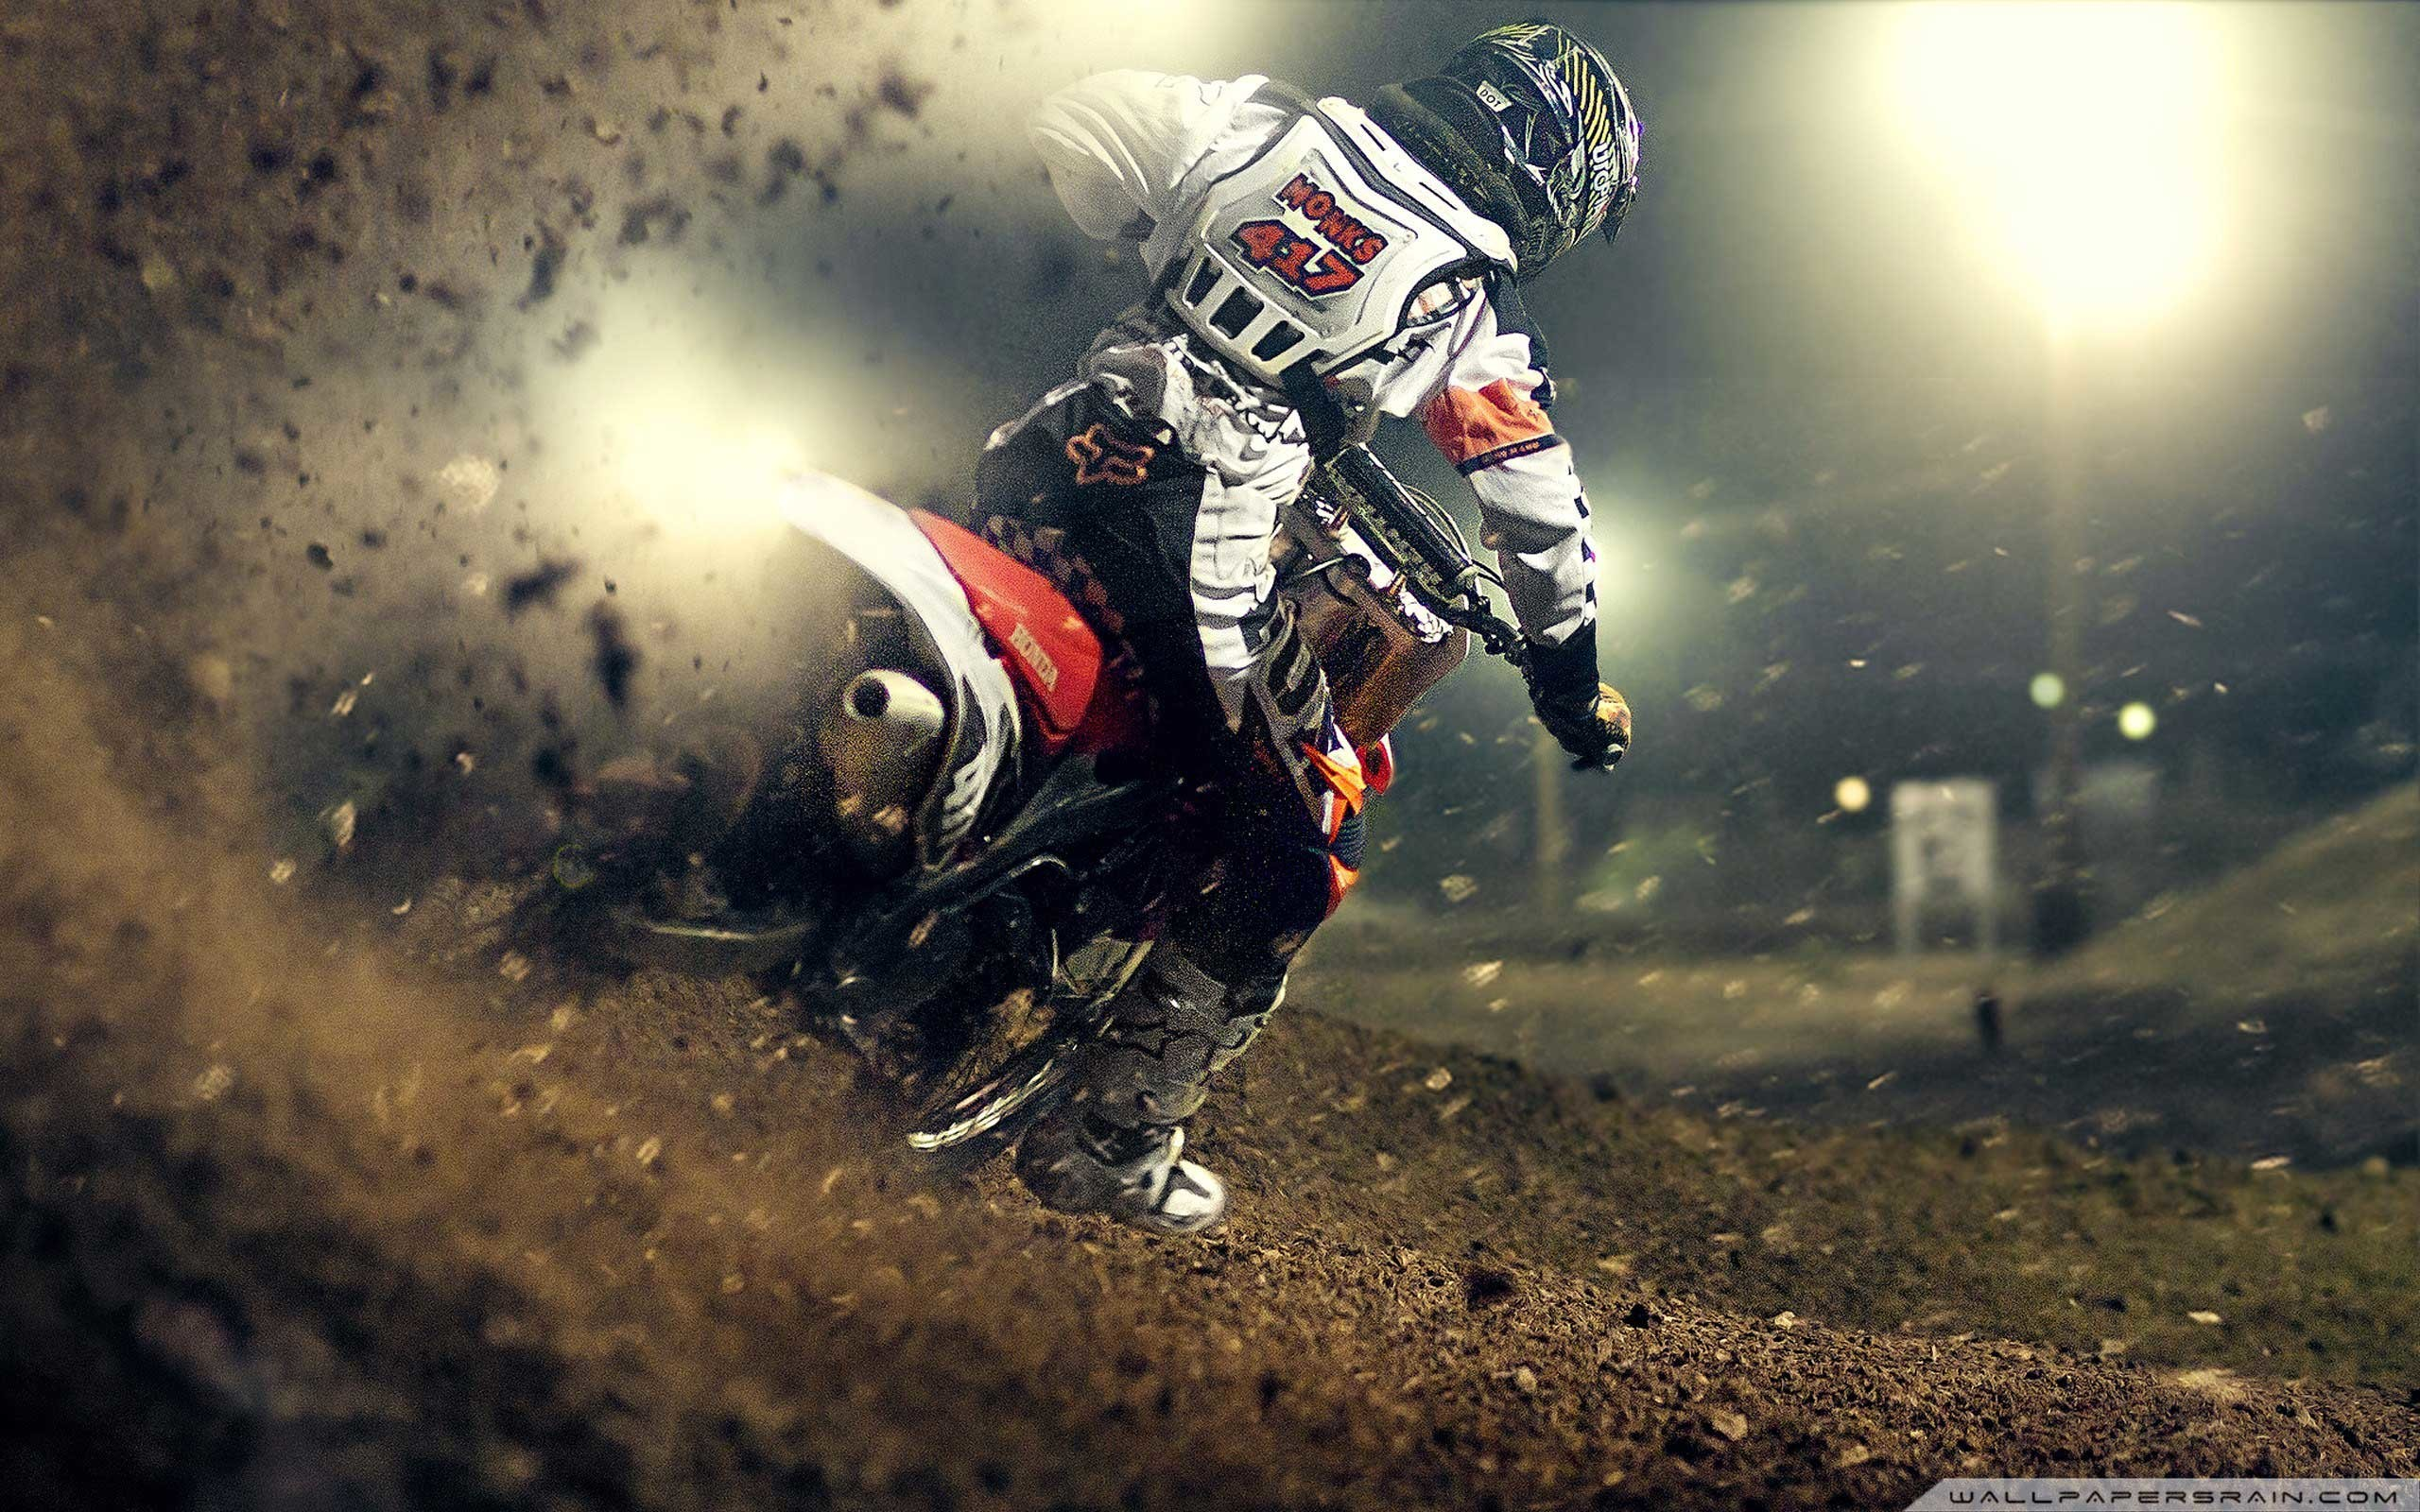 3840x2160 Kawasaki Motocross Dirt Bikes Ultra HD 4K Wallpapers